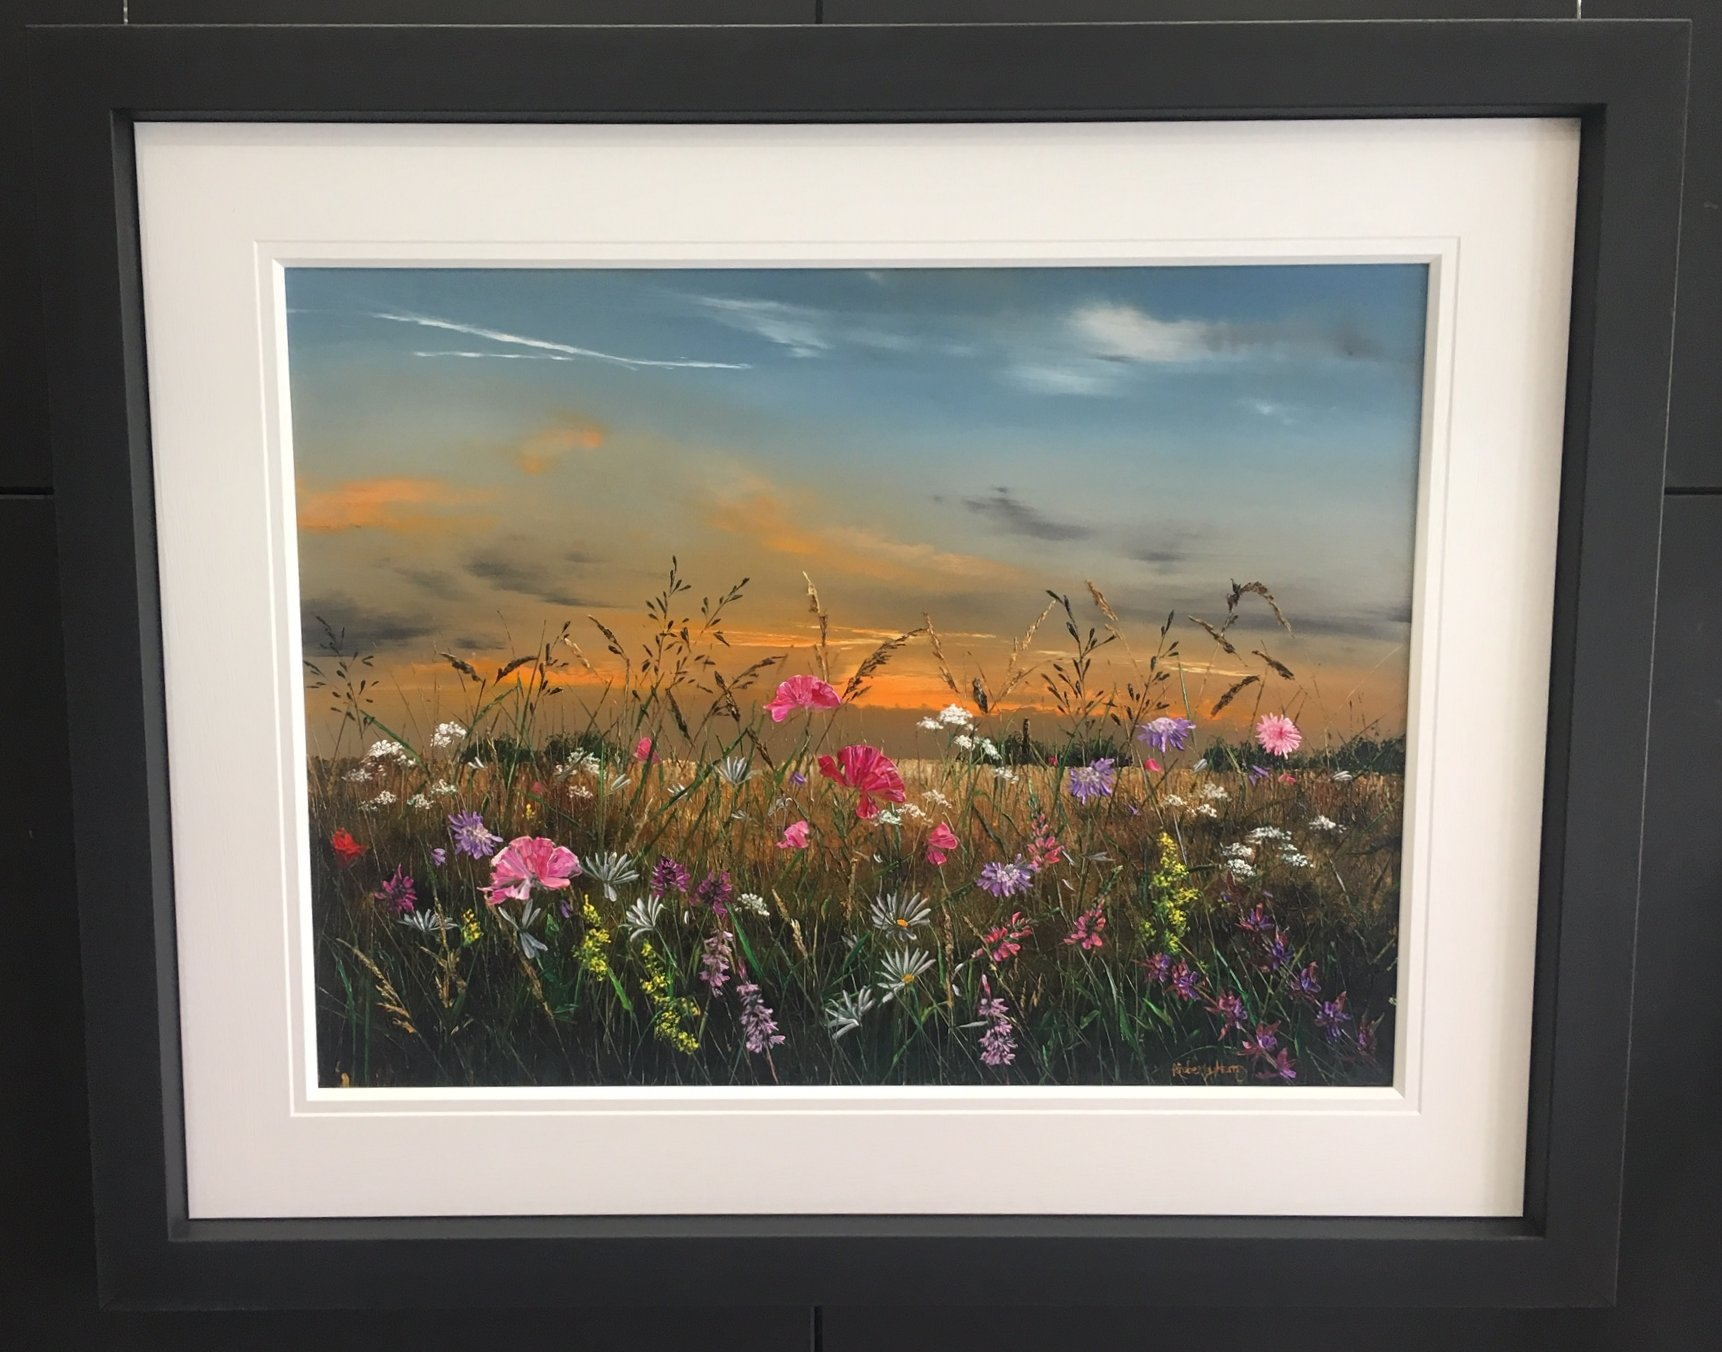 Morning Light by Kimberley Harris